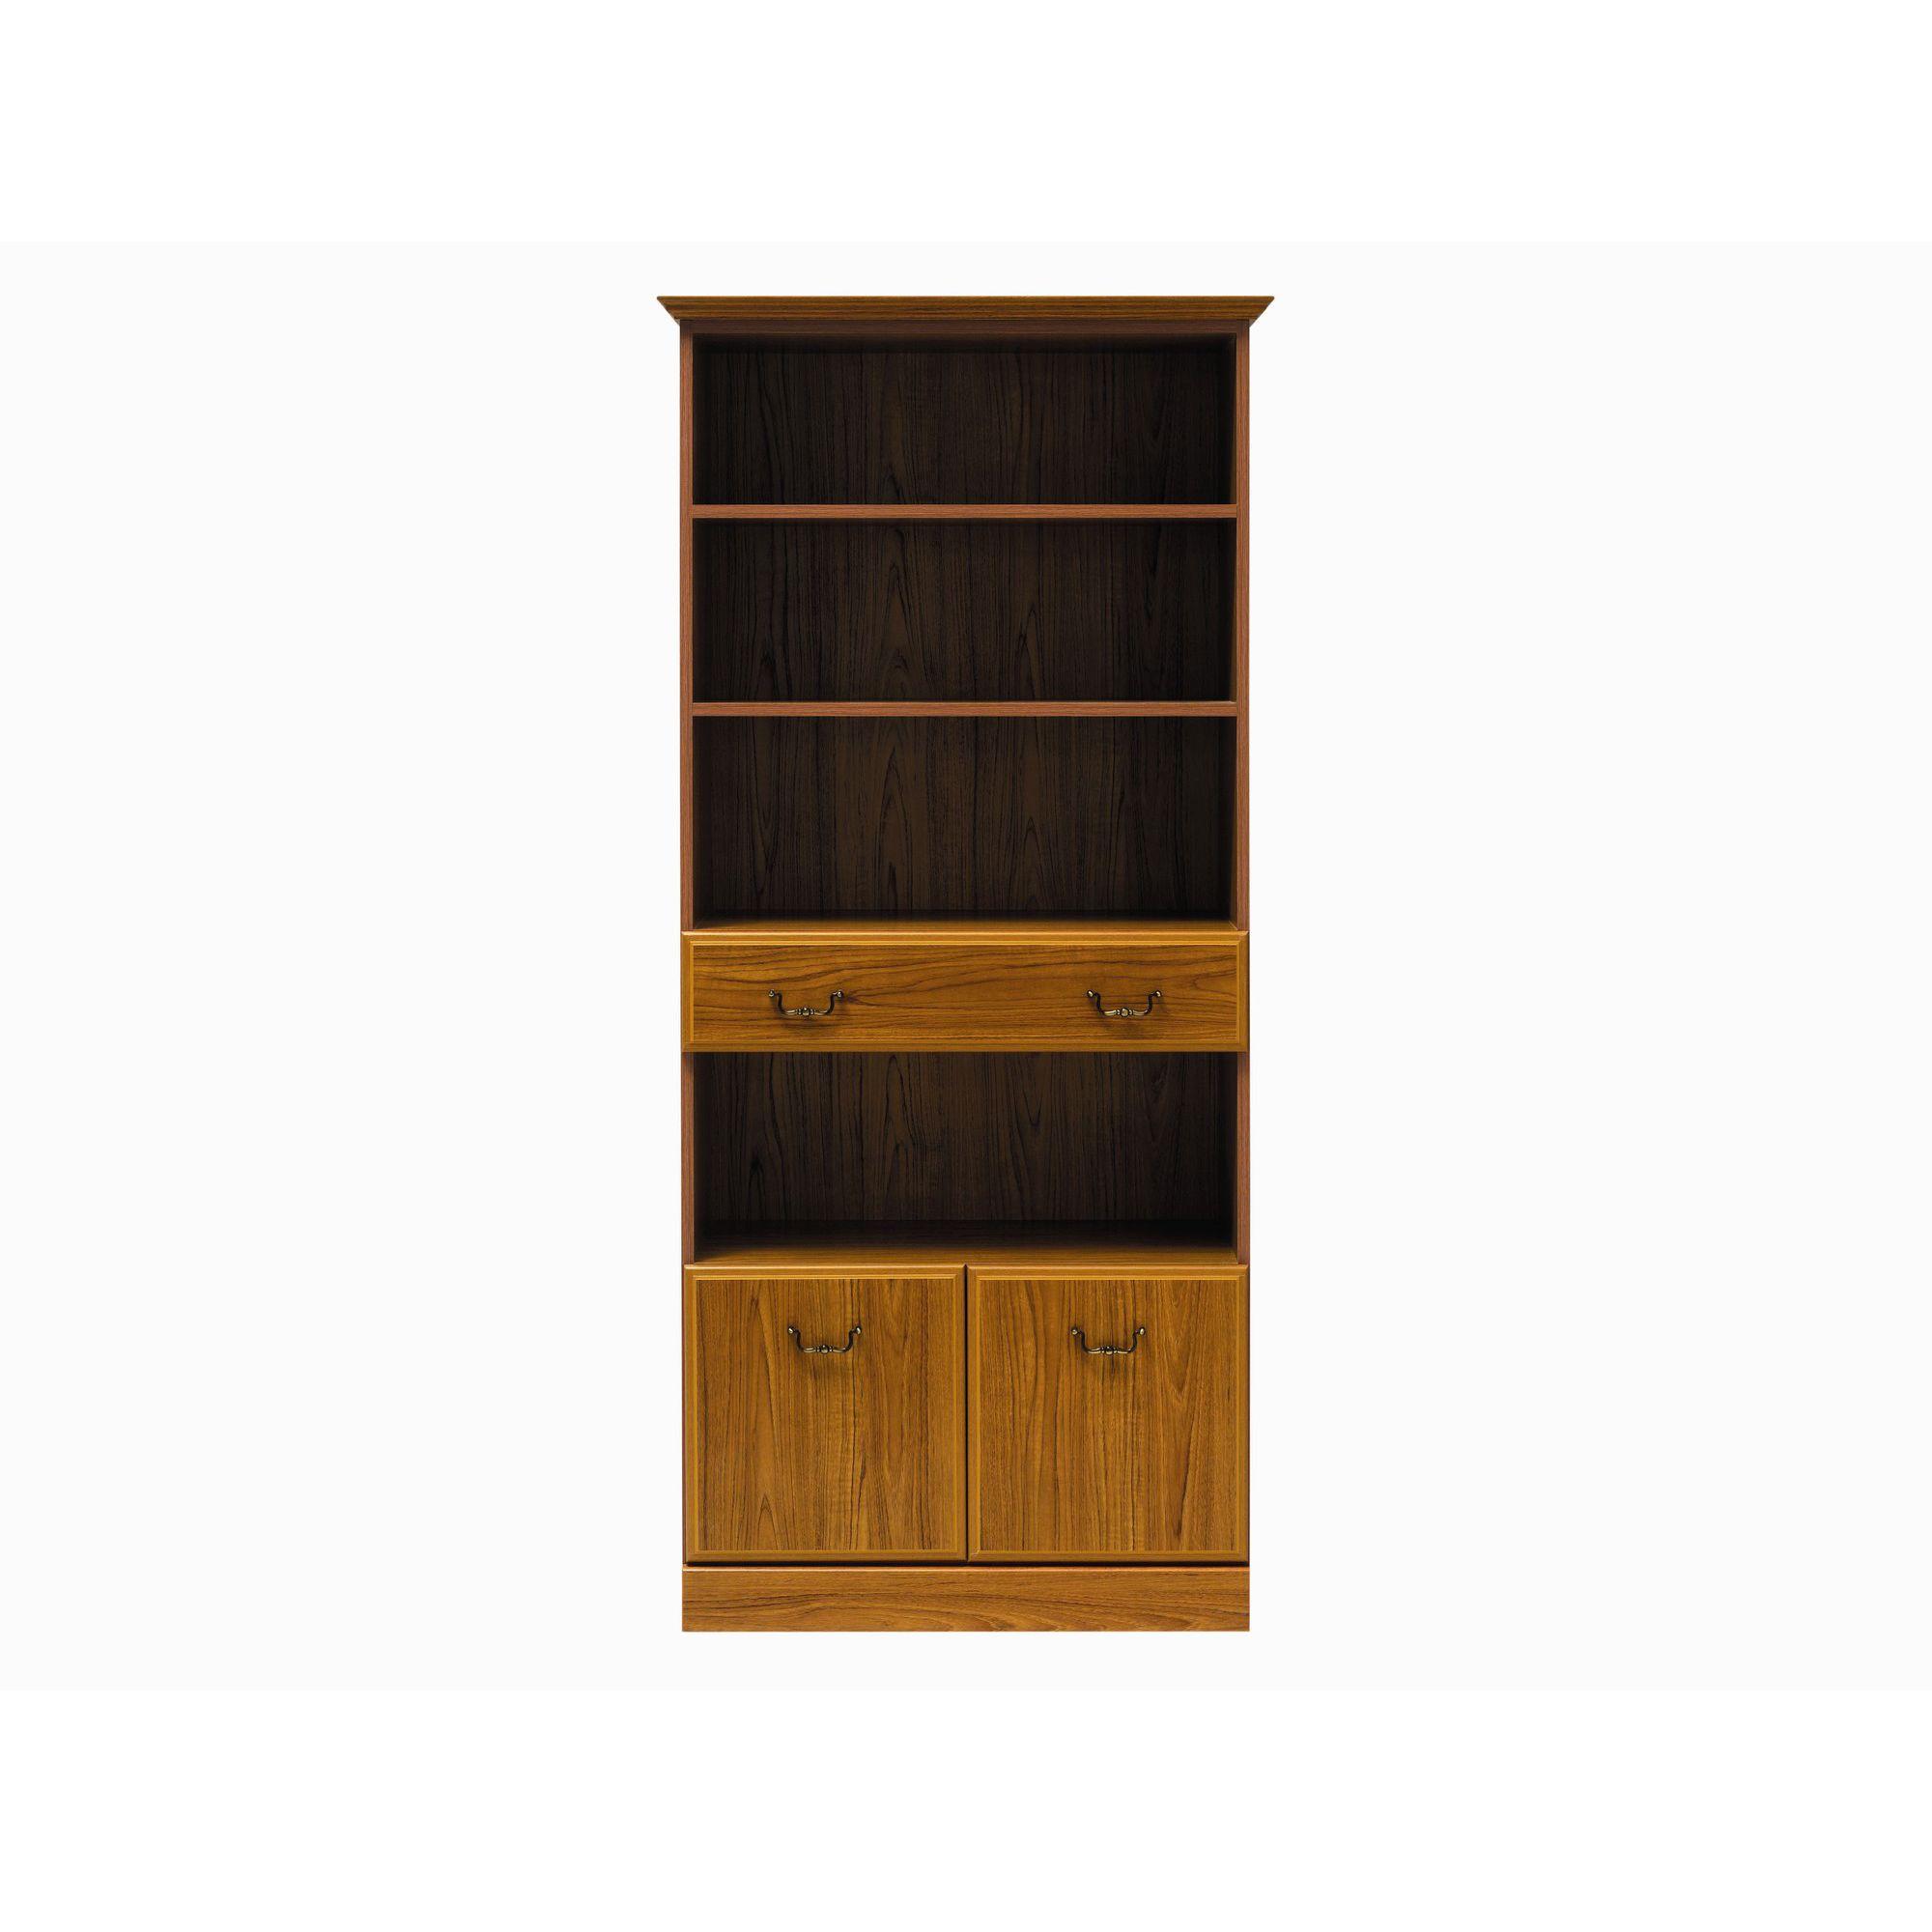 Caxton Tennyson Tall Bookcase in Teak at Tesco Direct